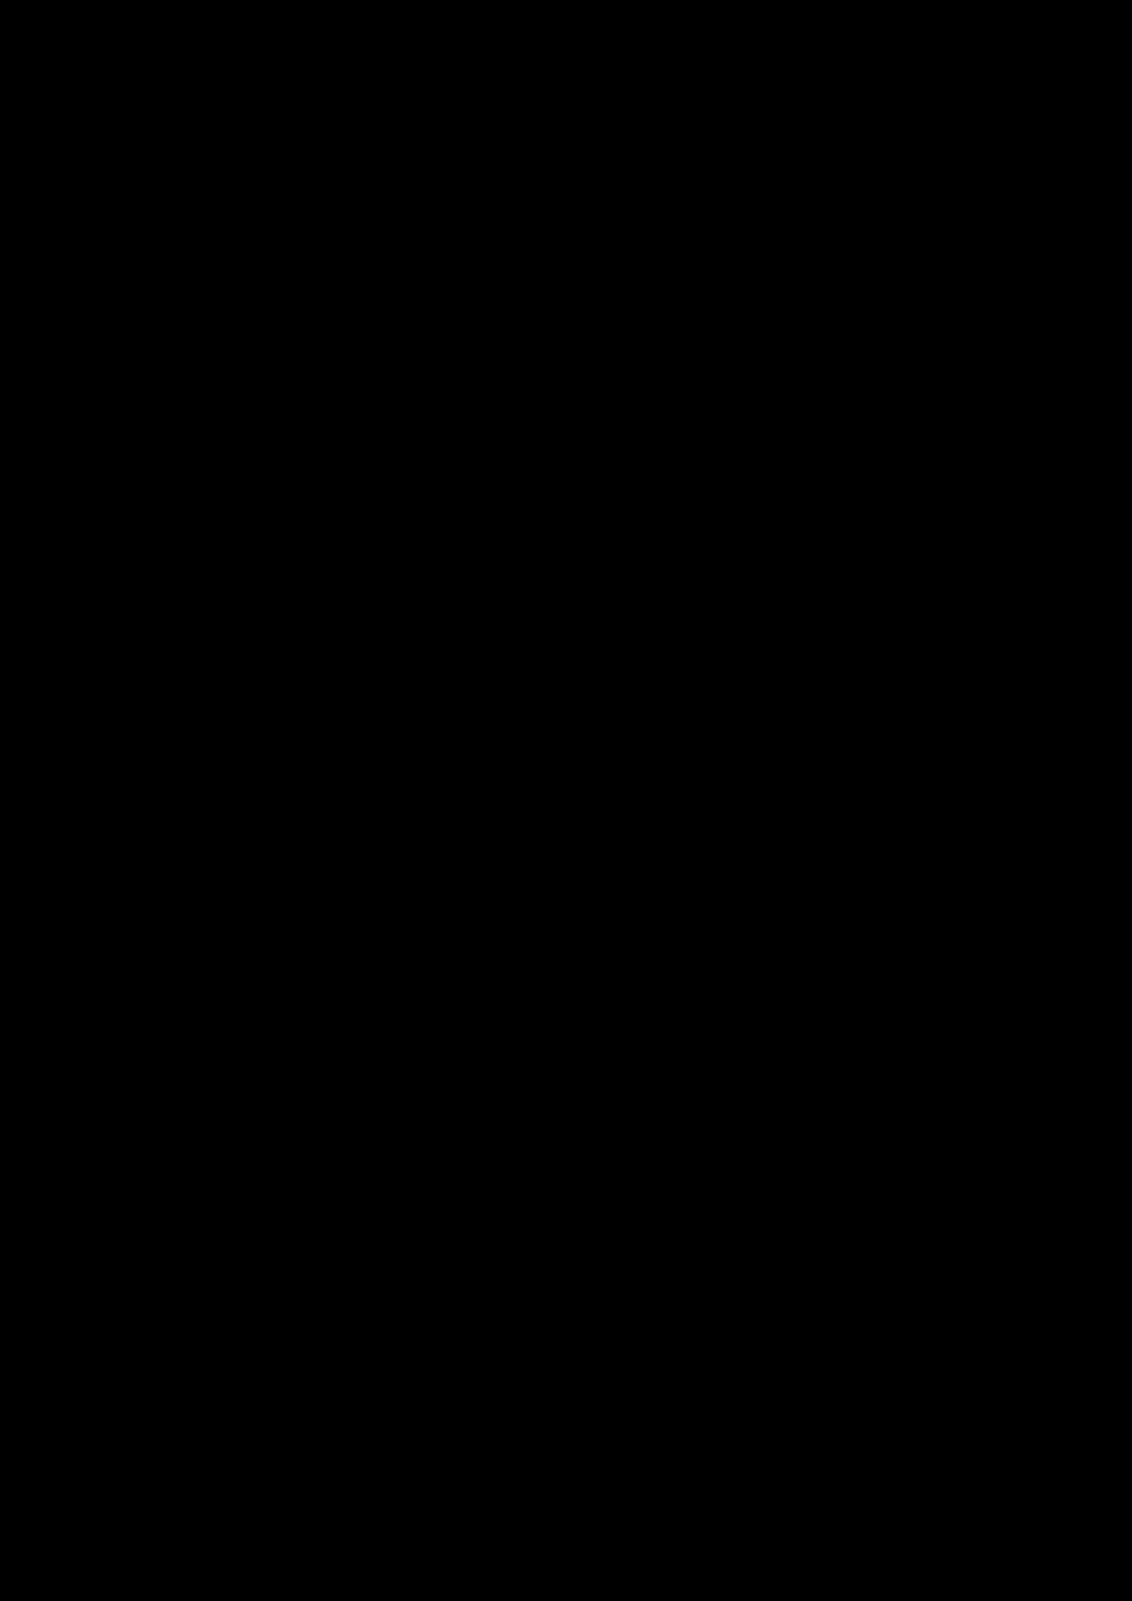 Korolevstvo slez slide, Image 45